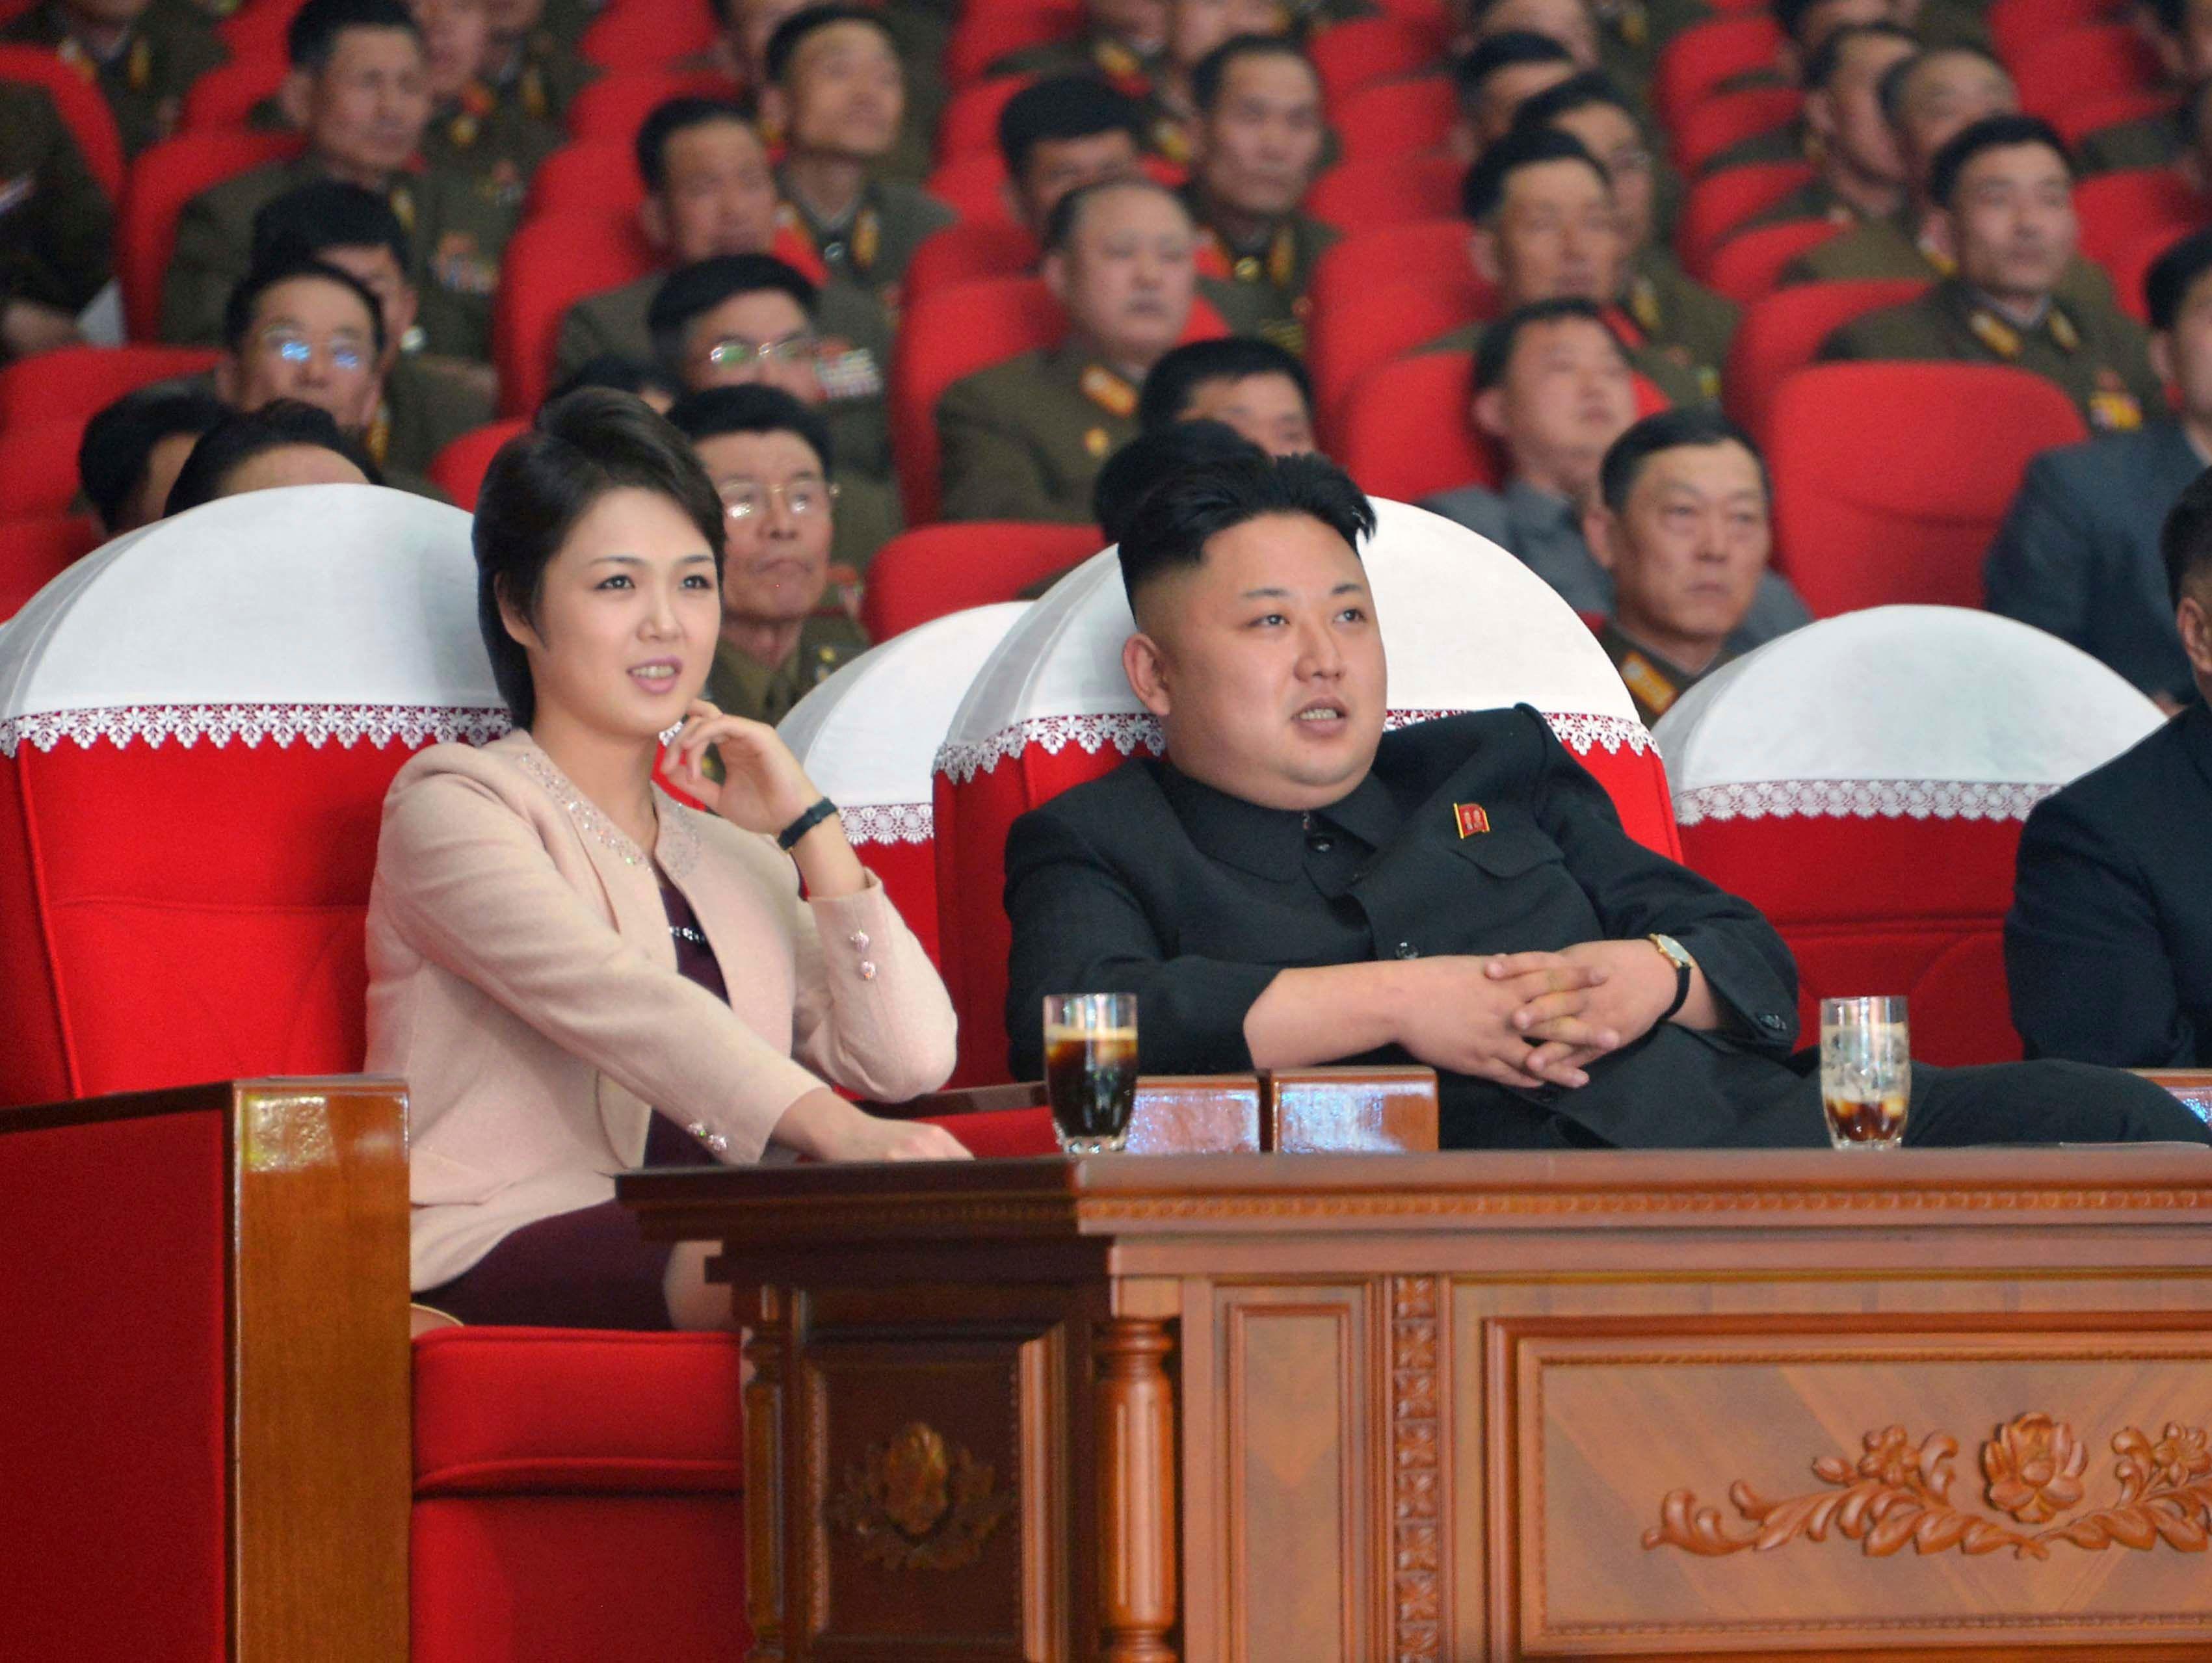 Pyongyang-Upon-Avon: A Pop Quiz